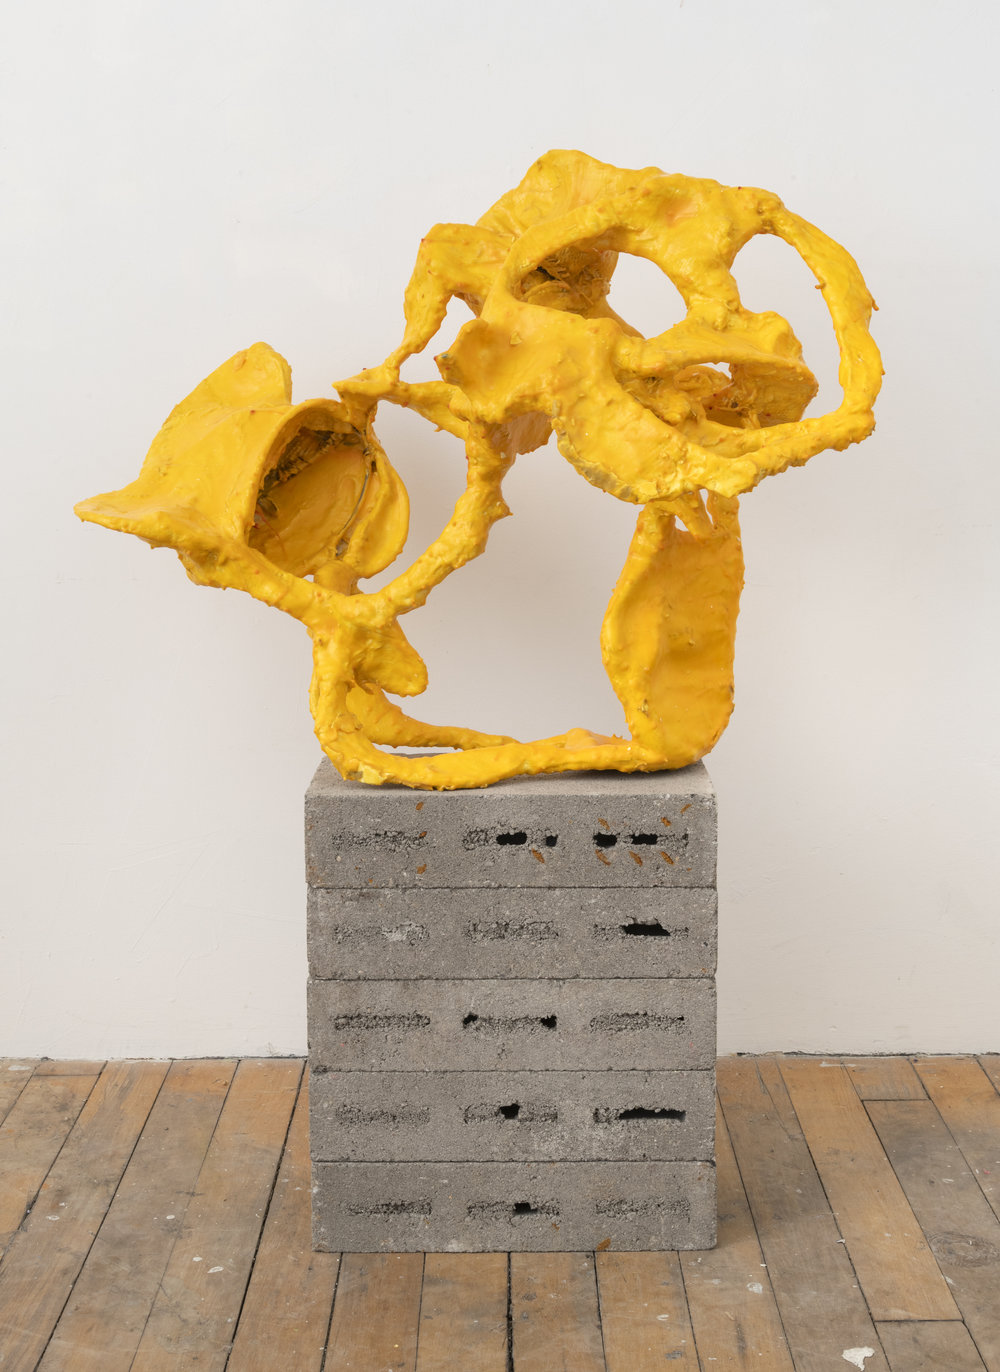 modern dance (martha graham),  2018 plaster, burlap, wire and glue 44 x 31 x 19 inches